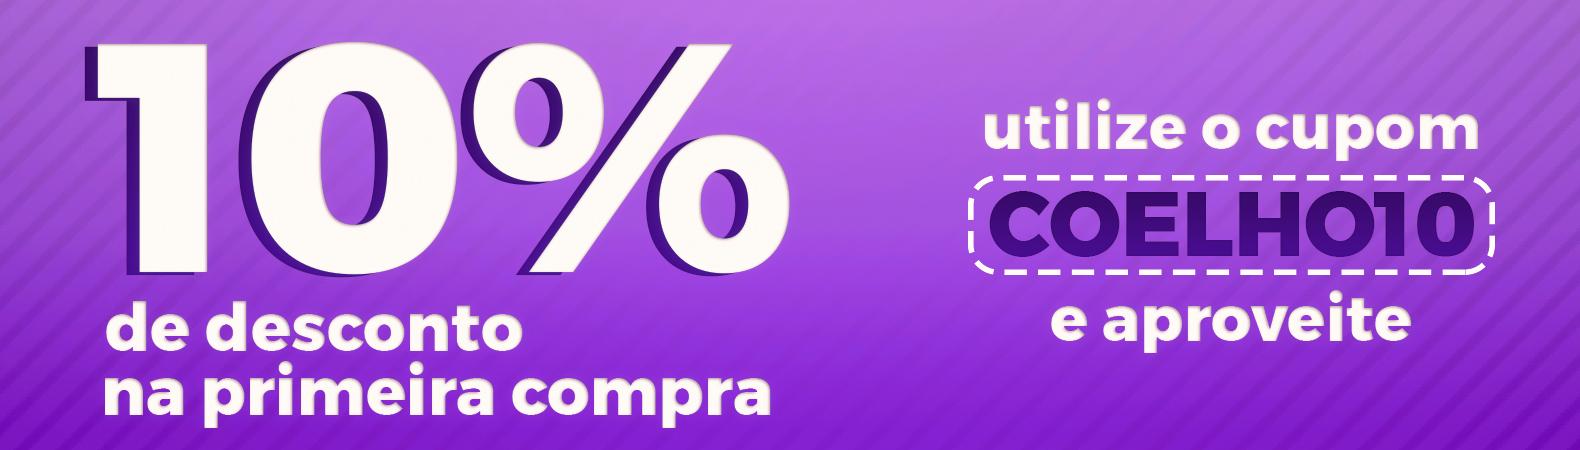 Cupom 10%